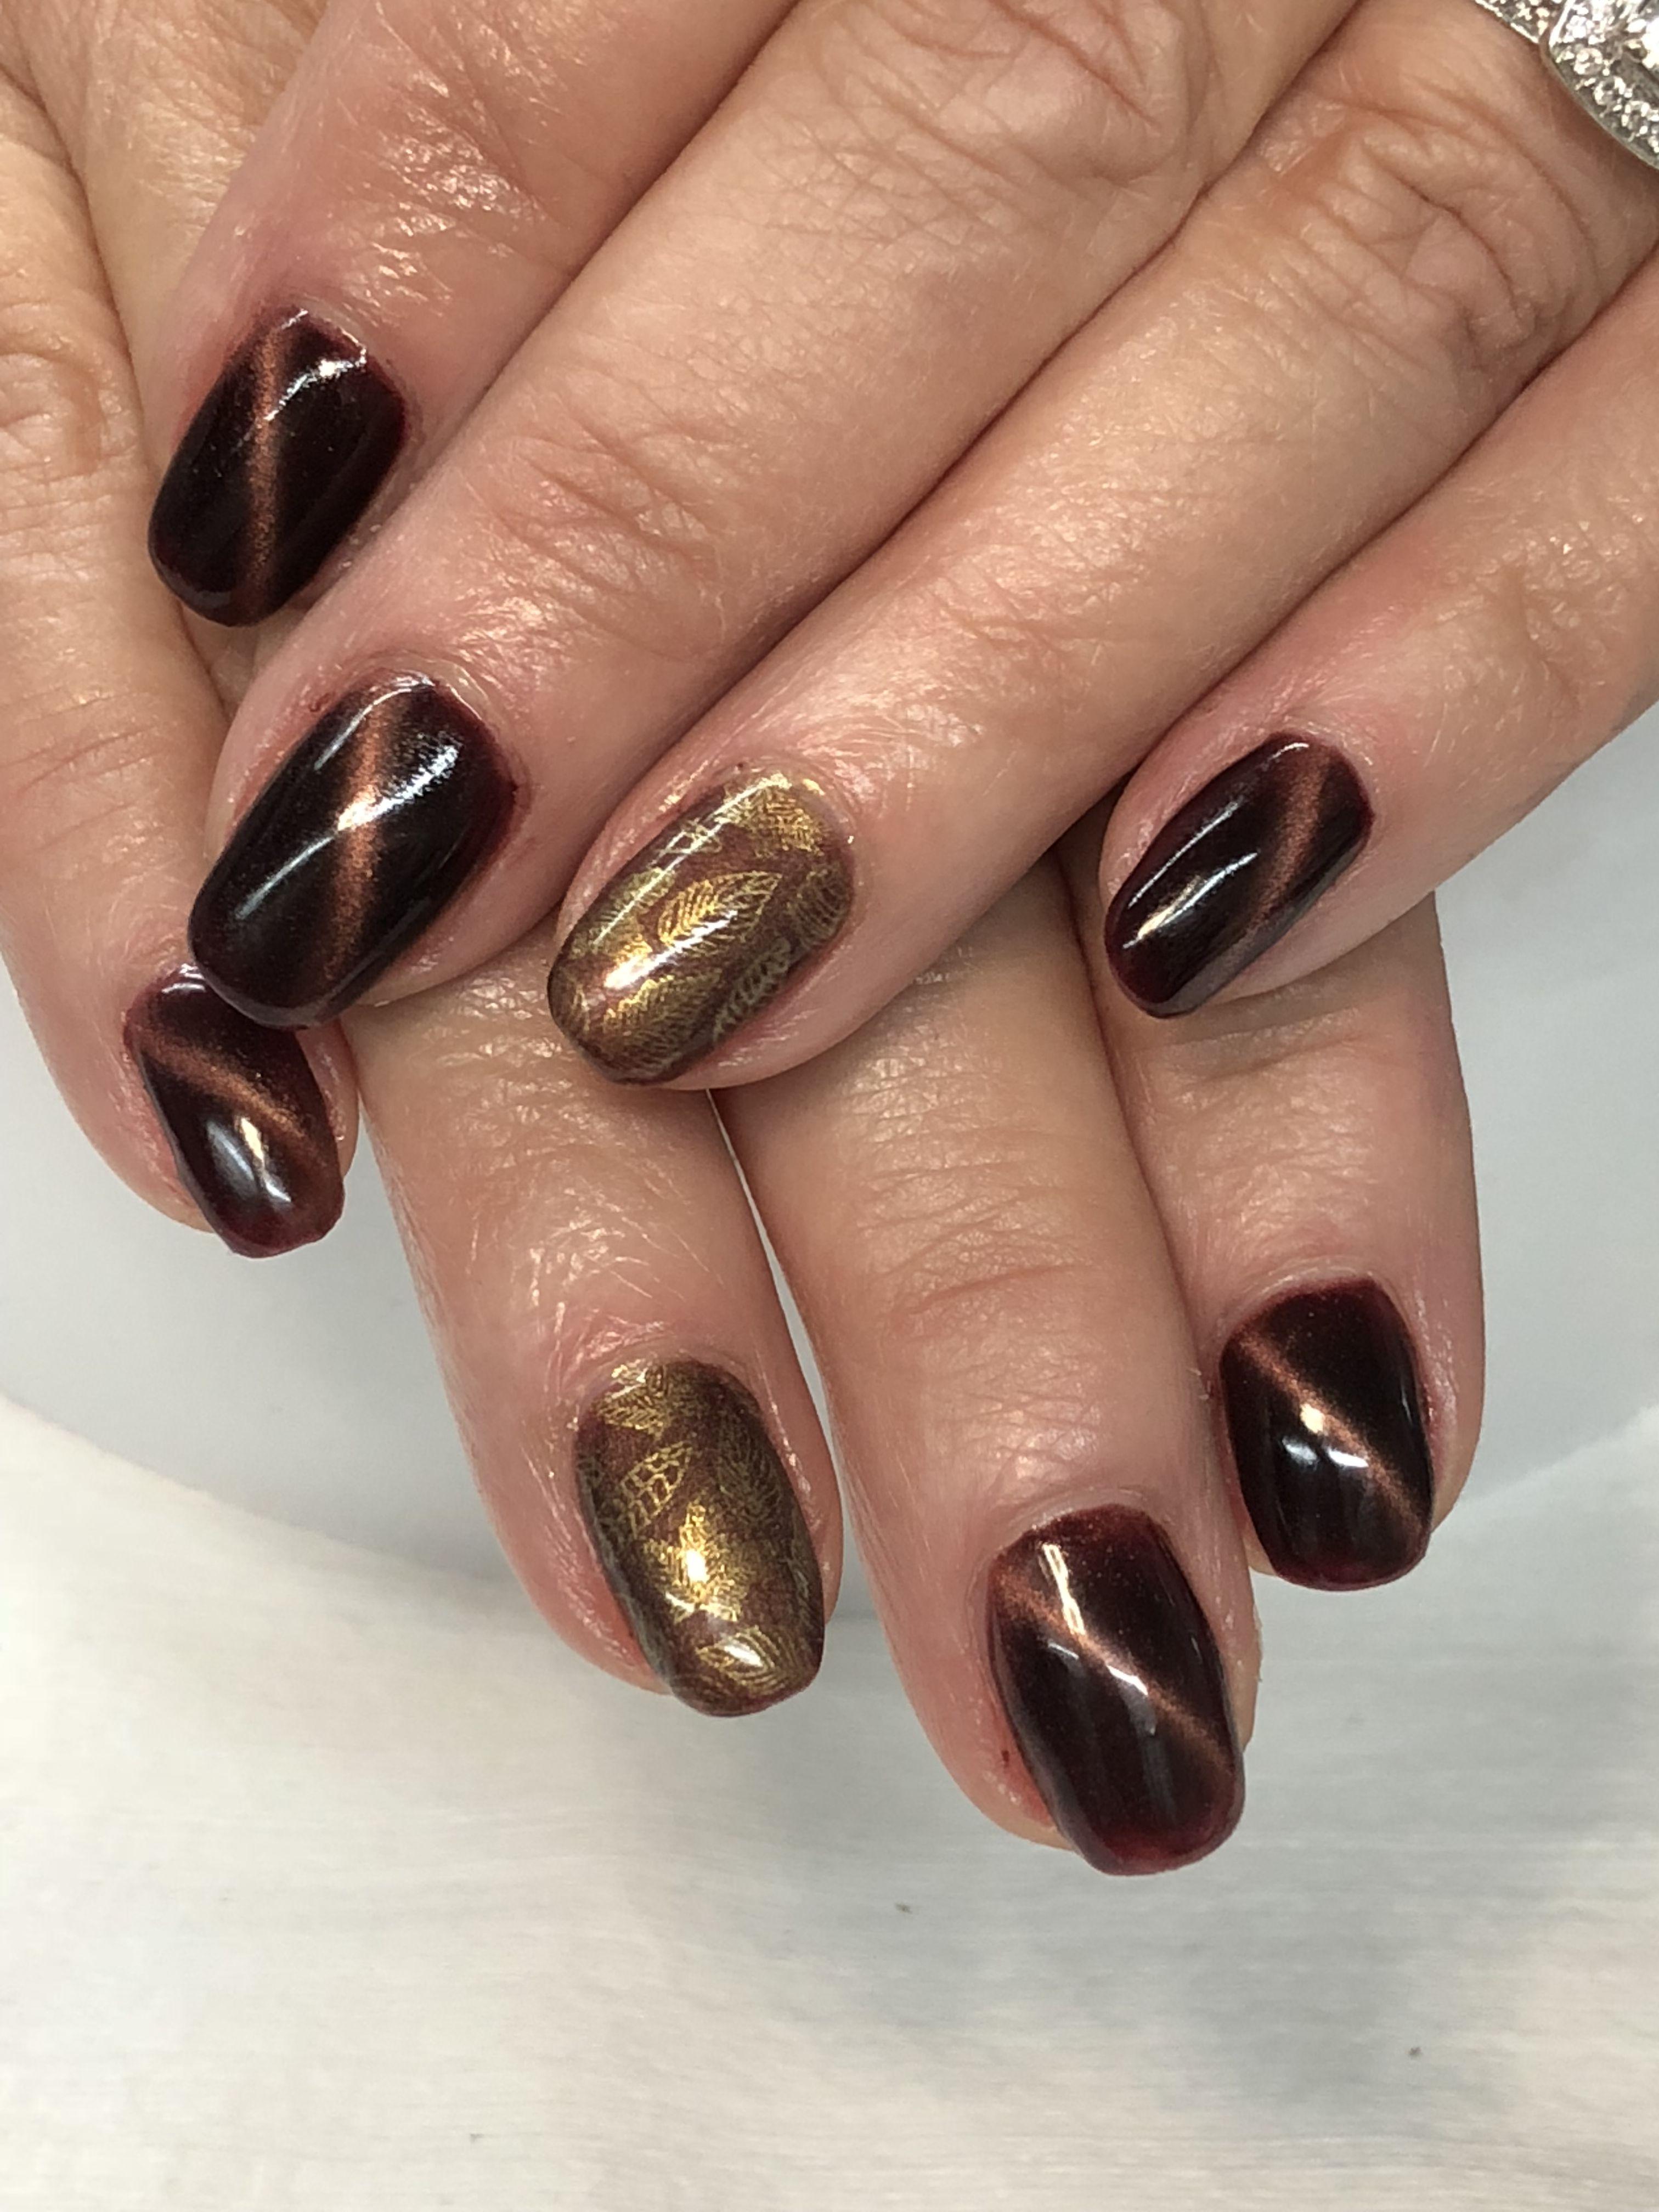 Fall Leaves Magnetic Gel Nails Hot Nails Gel Nail Designs Nails